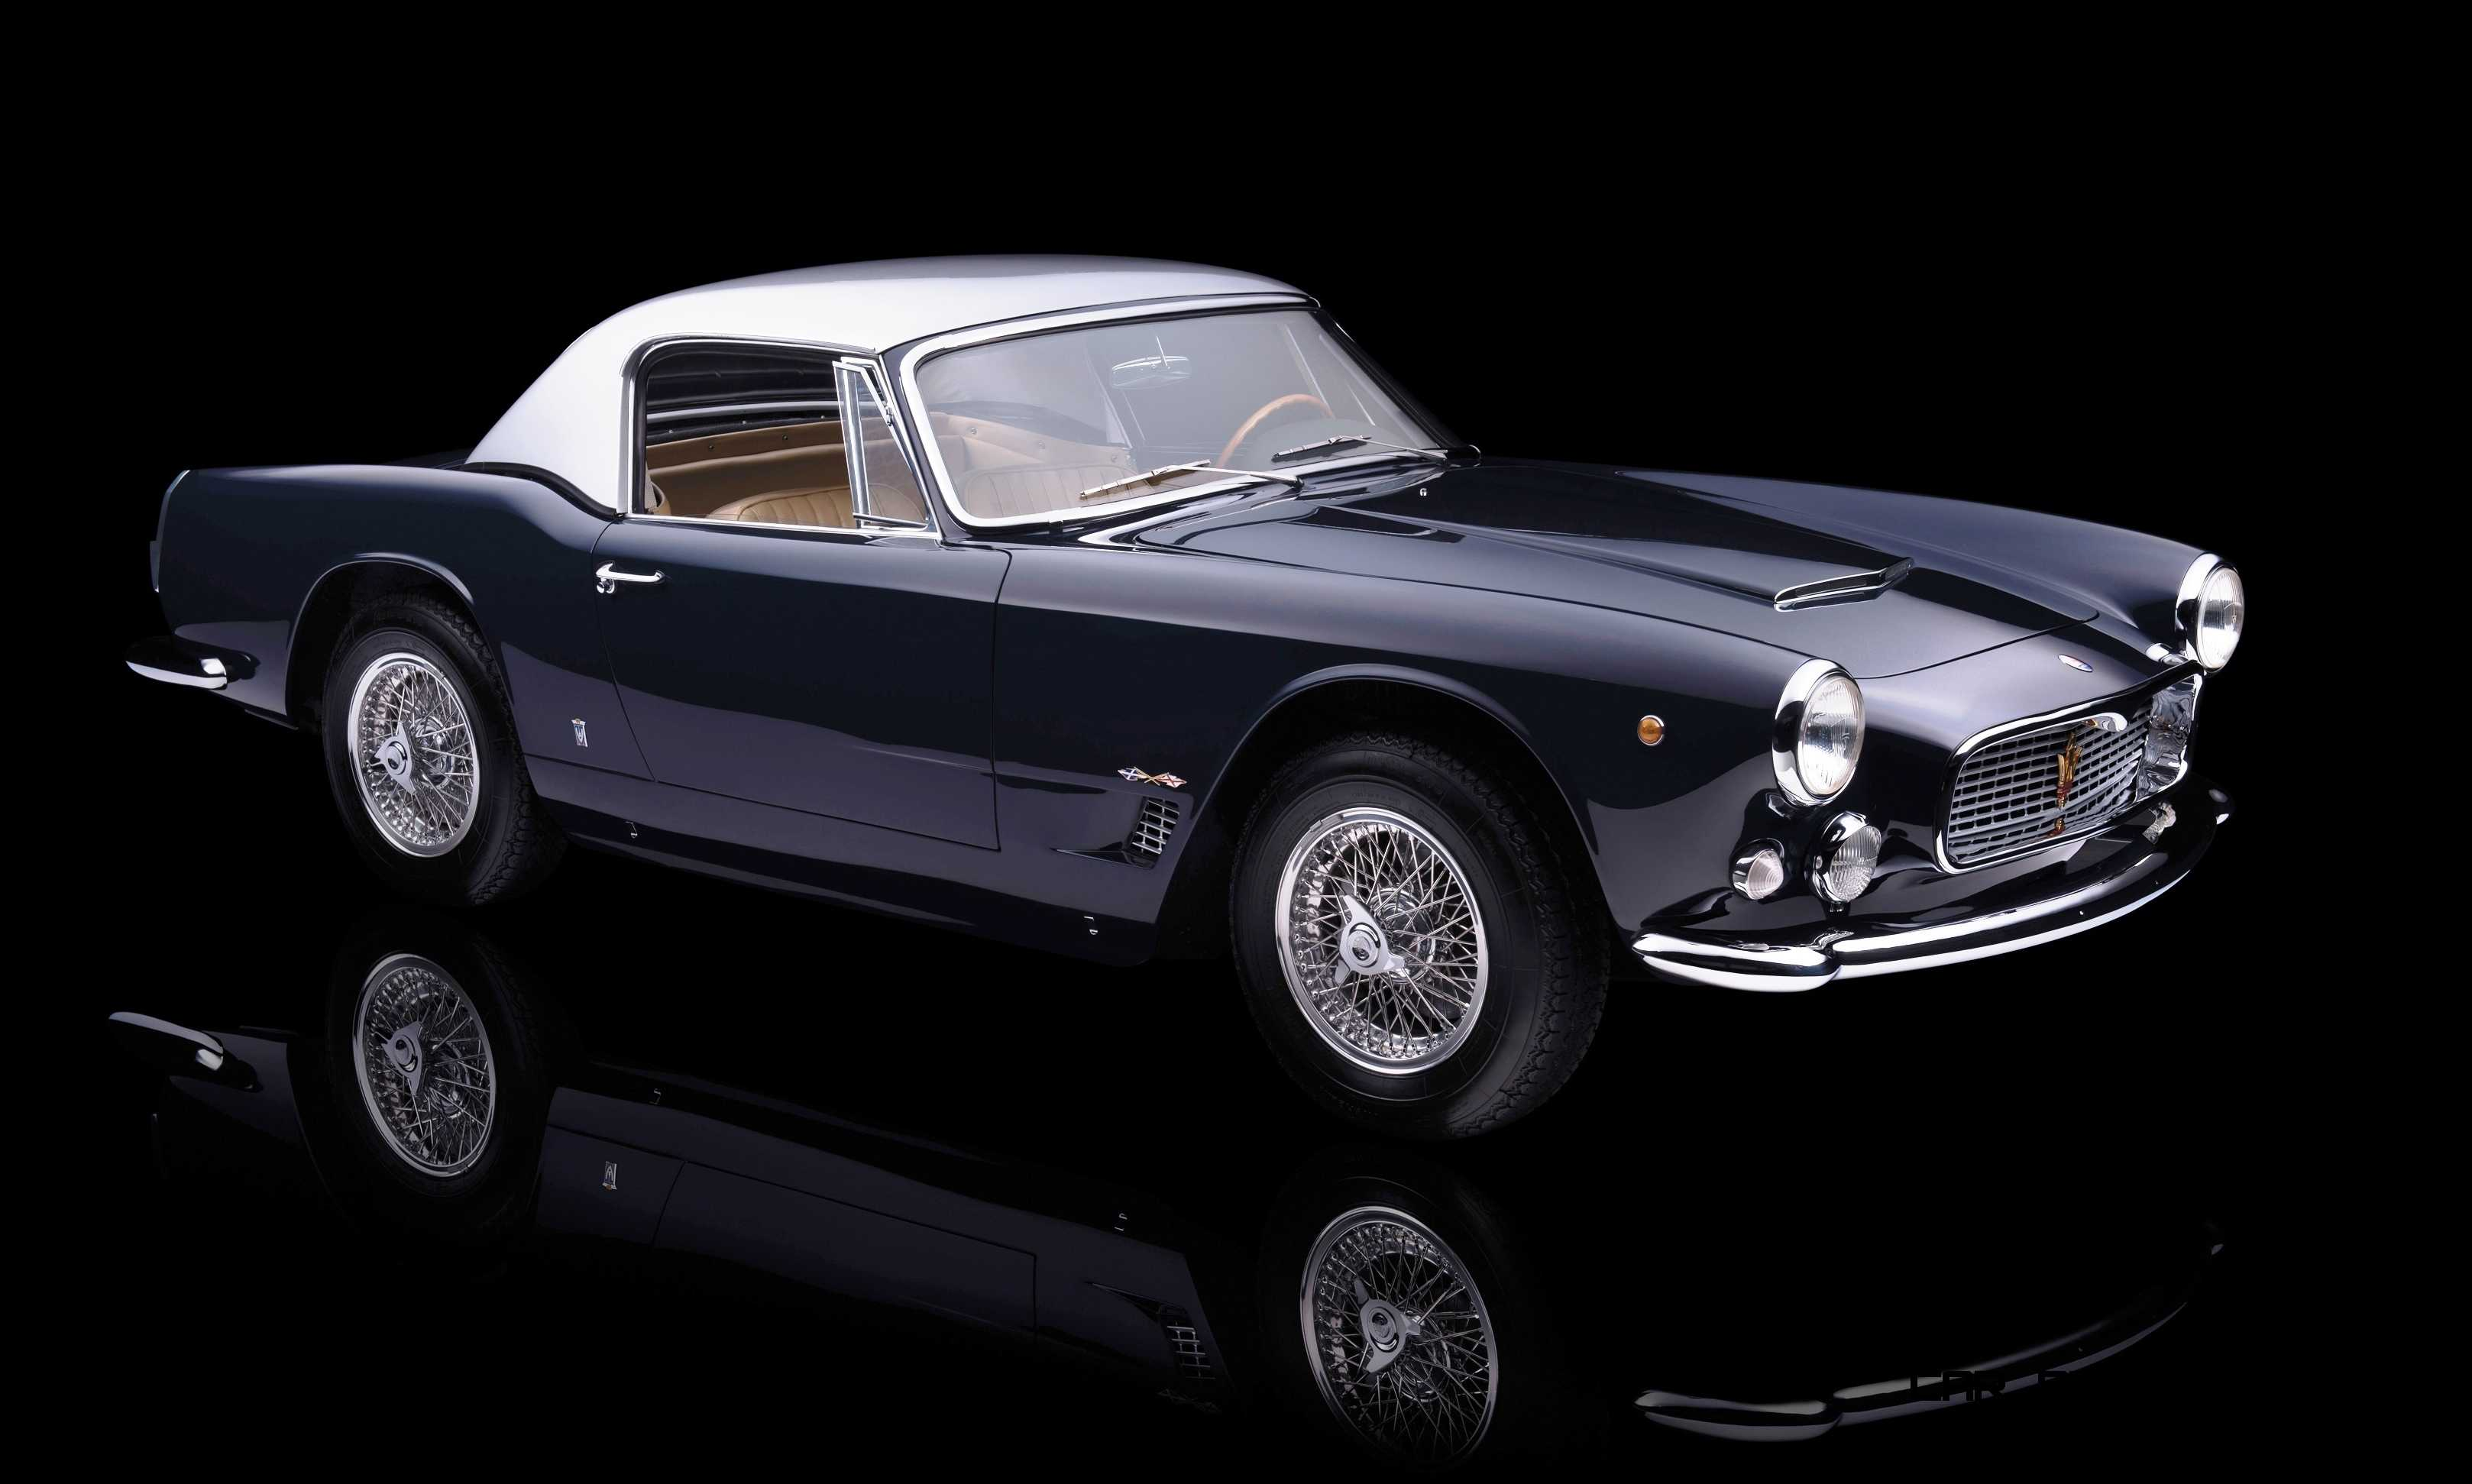 1961 Maserati 3500gt Vignale Spyder